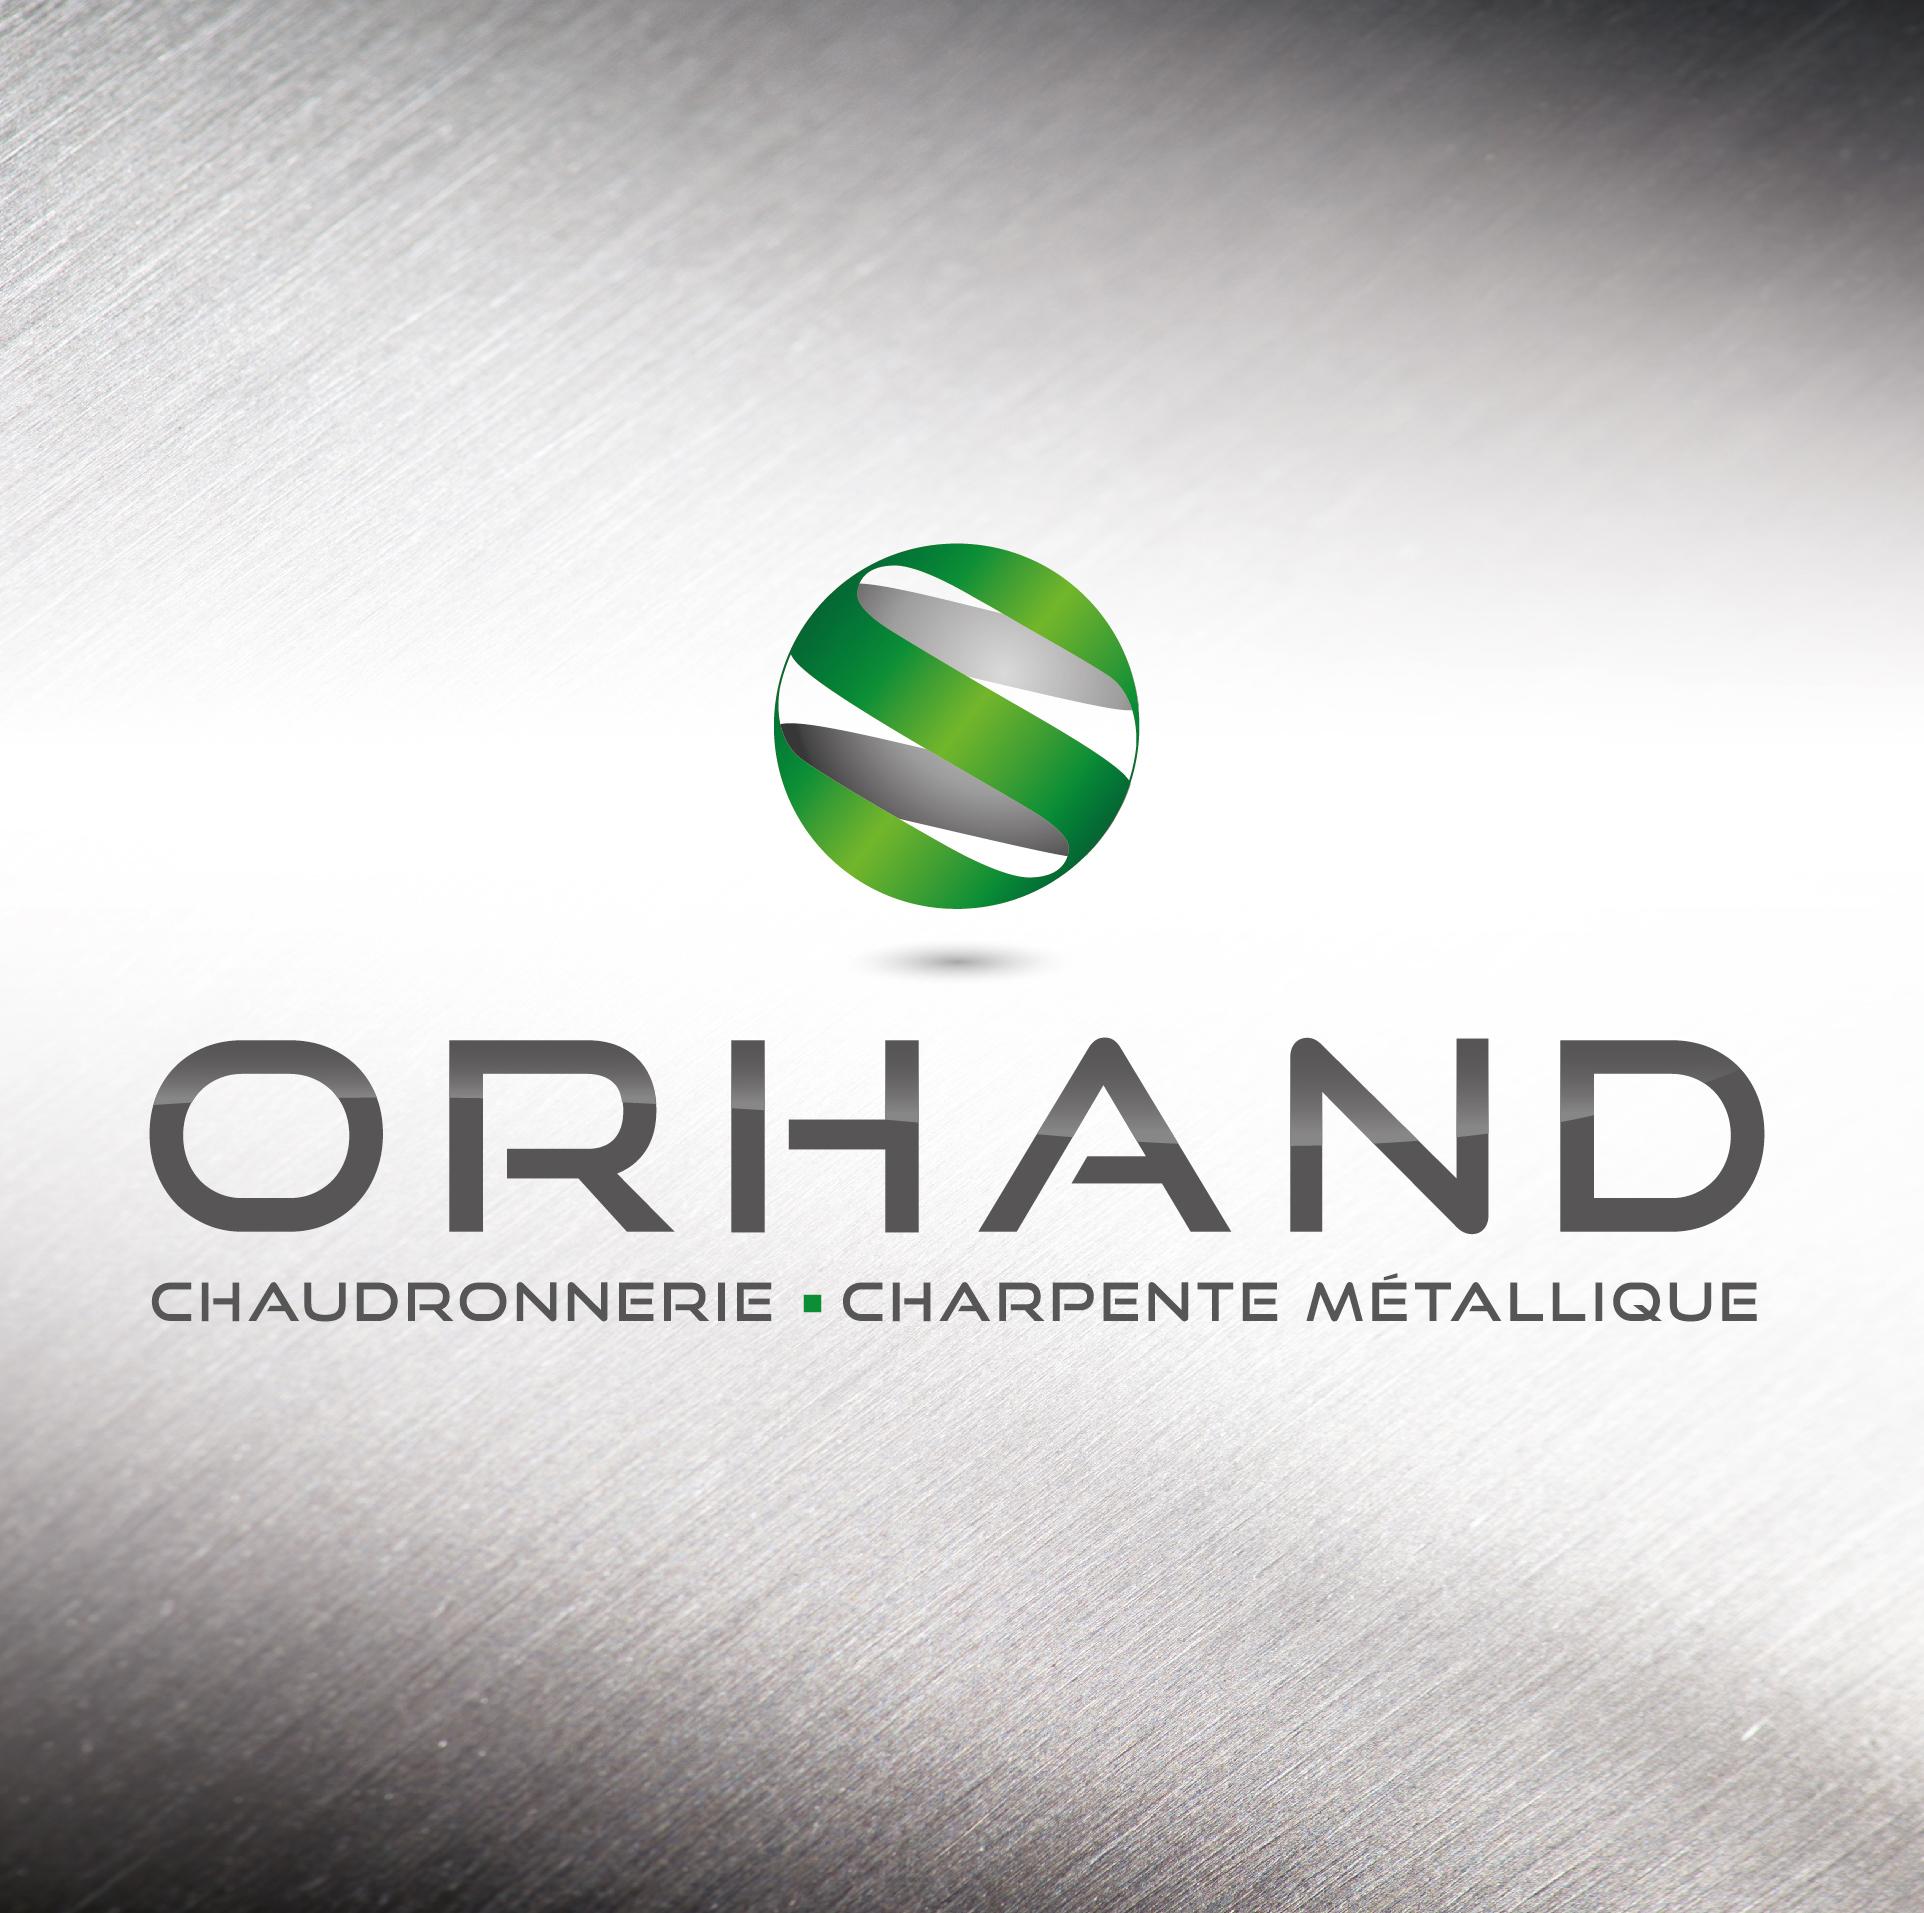 Orhand